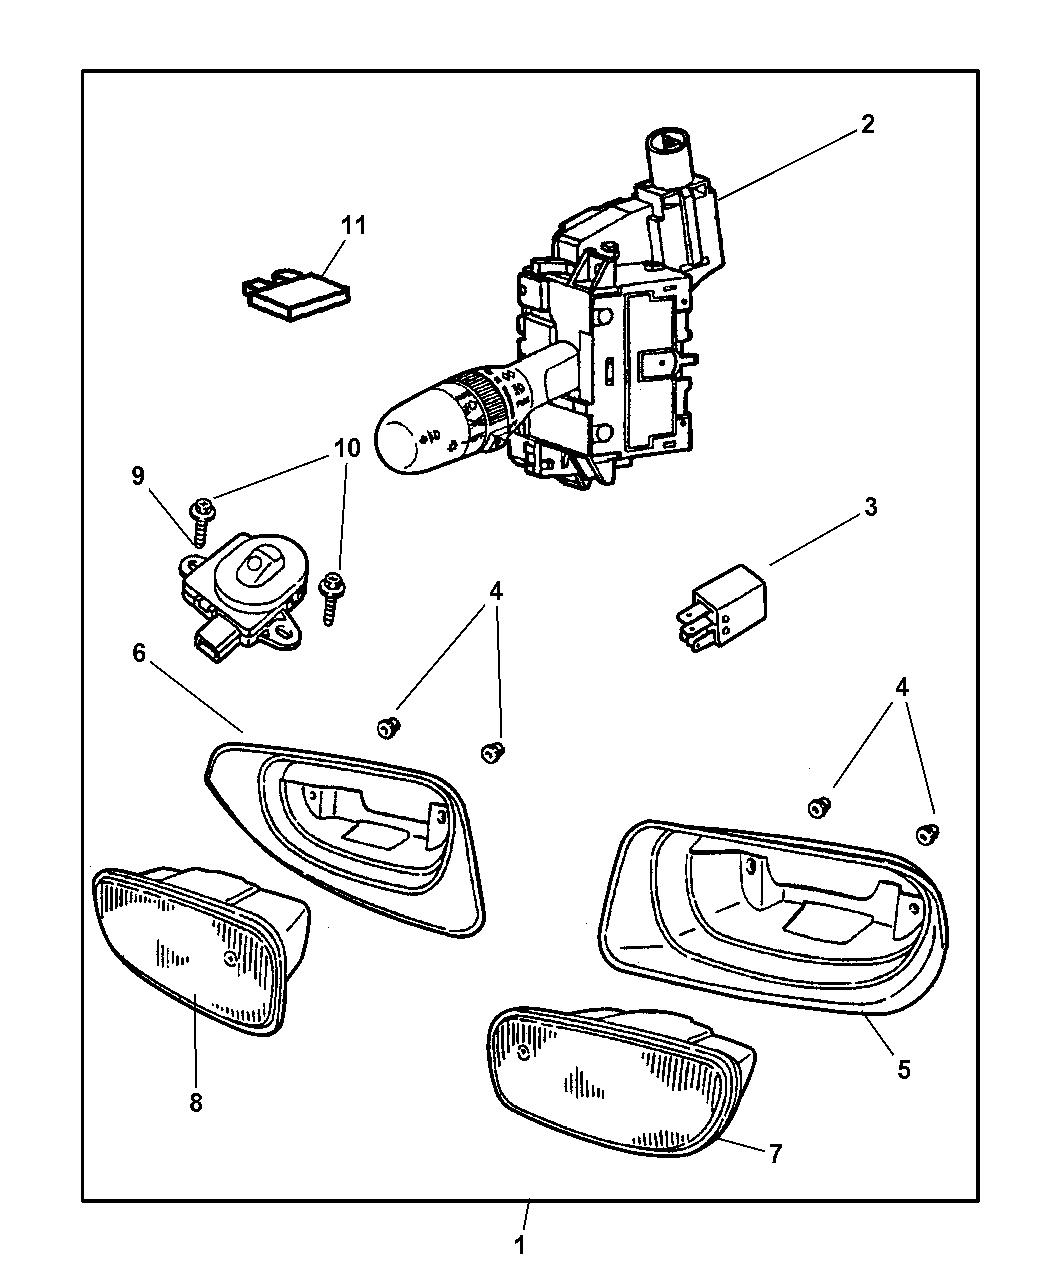 2000 Jeep Grand Cherokee Light Package - Fog - Mopar Parts Giant